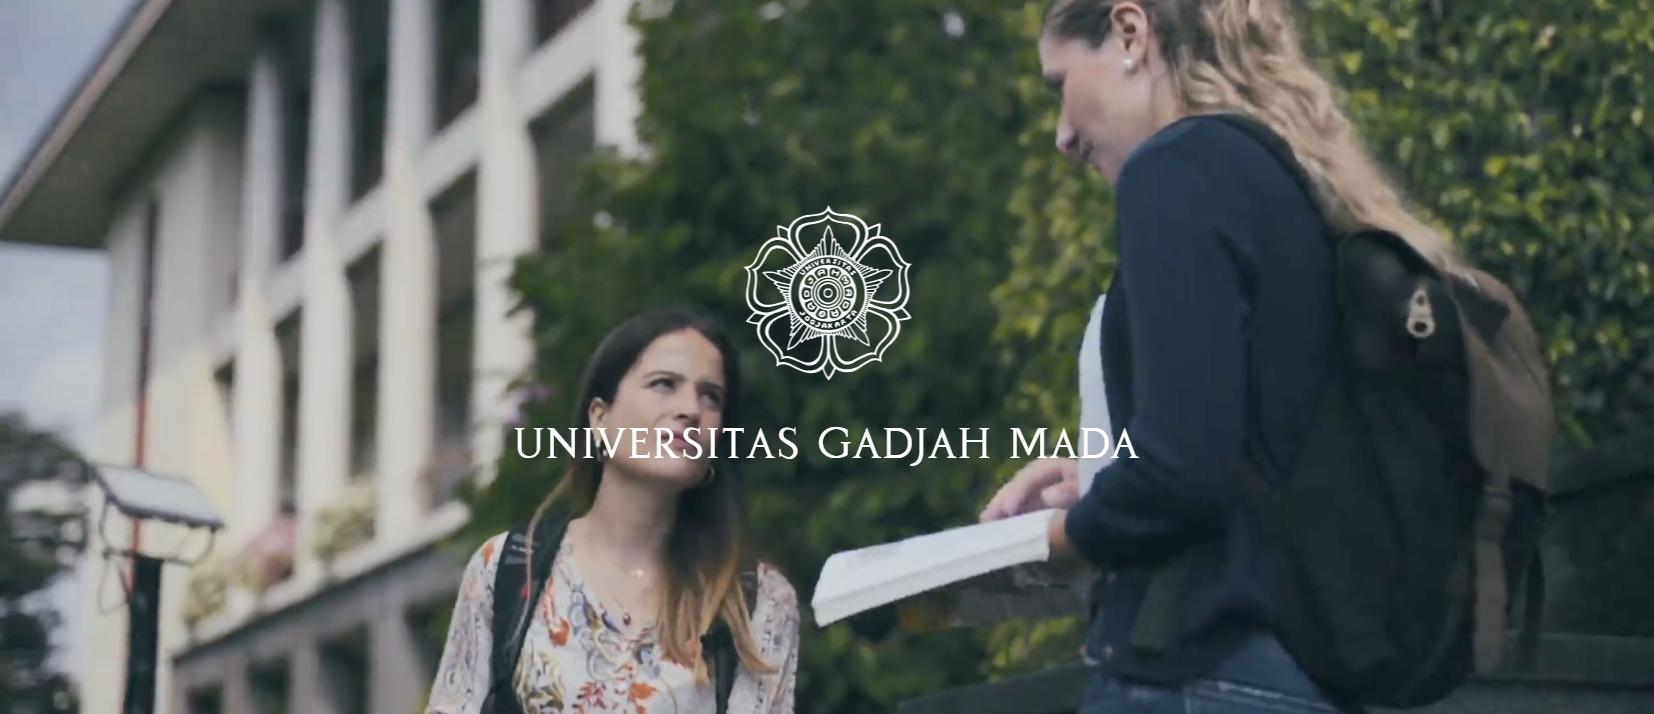 Universitas+Gadjah+Mada+(UGM)+case+study.png